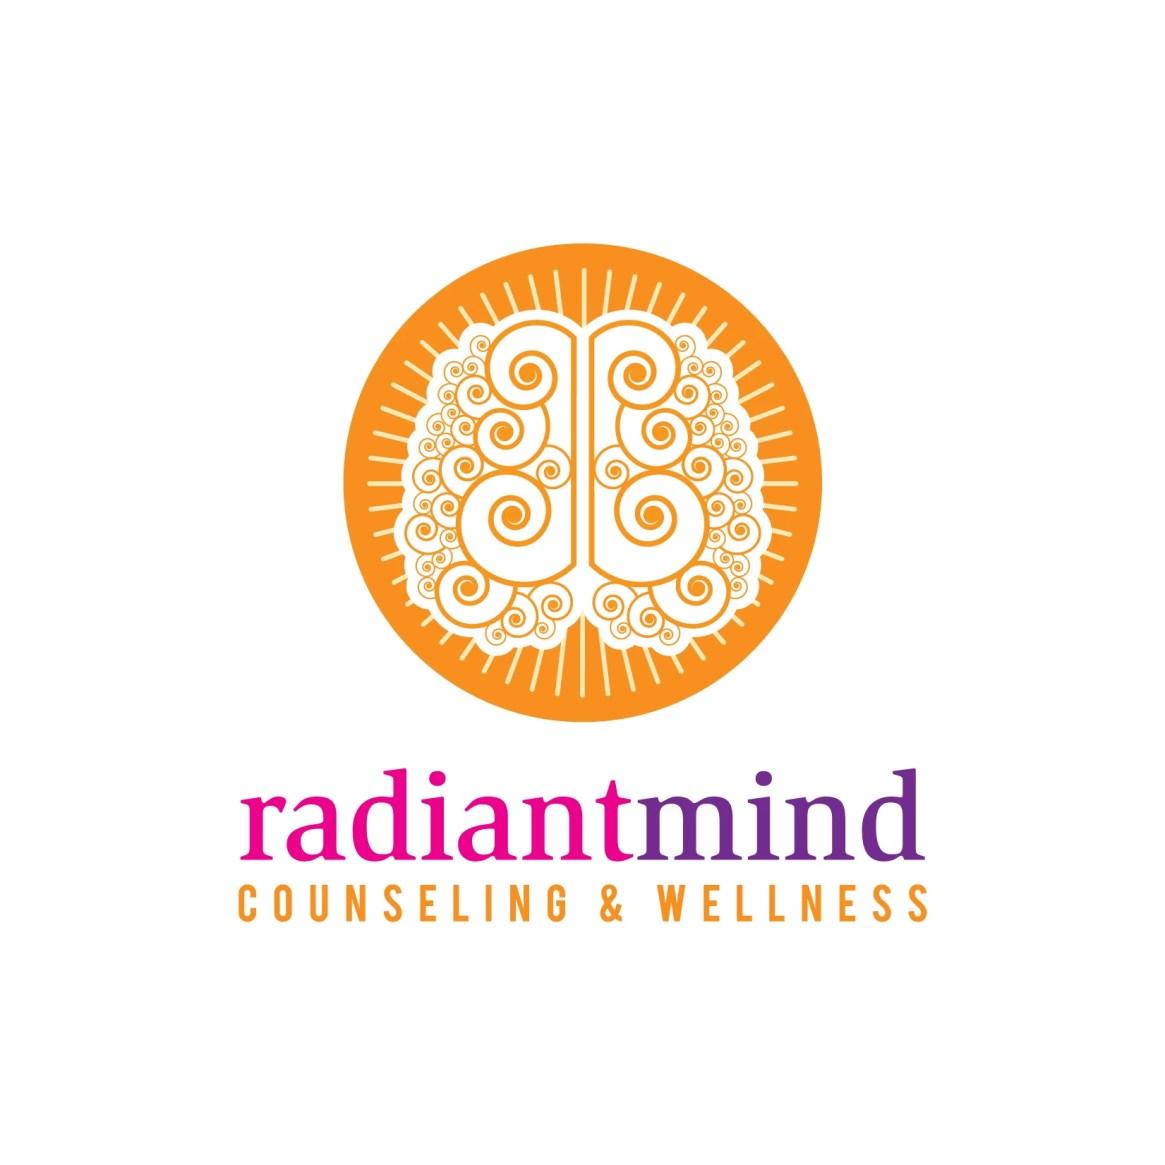 RadiiantMind Counseling & Wellness Logo